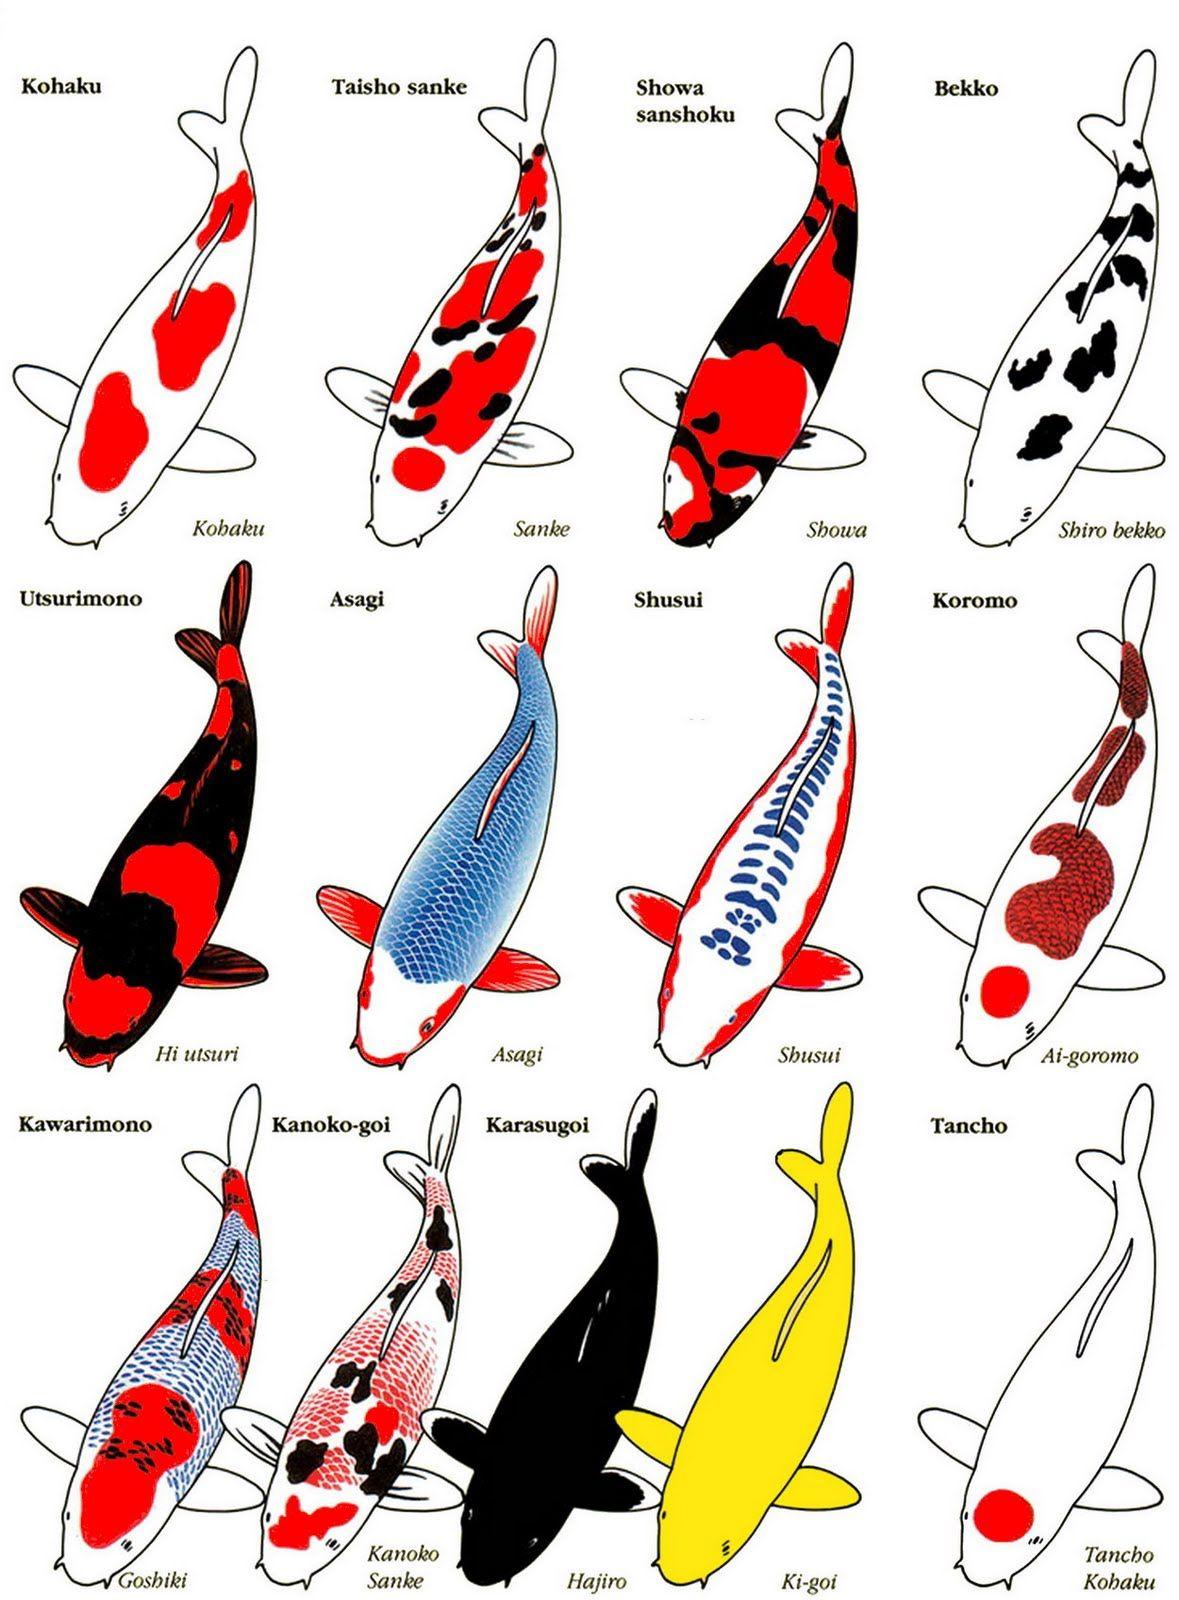 medium resolution of slighted koi ponds koi koi fish pond koi carp salmon life cycle koi fish life cycle diagram